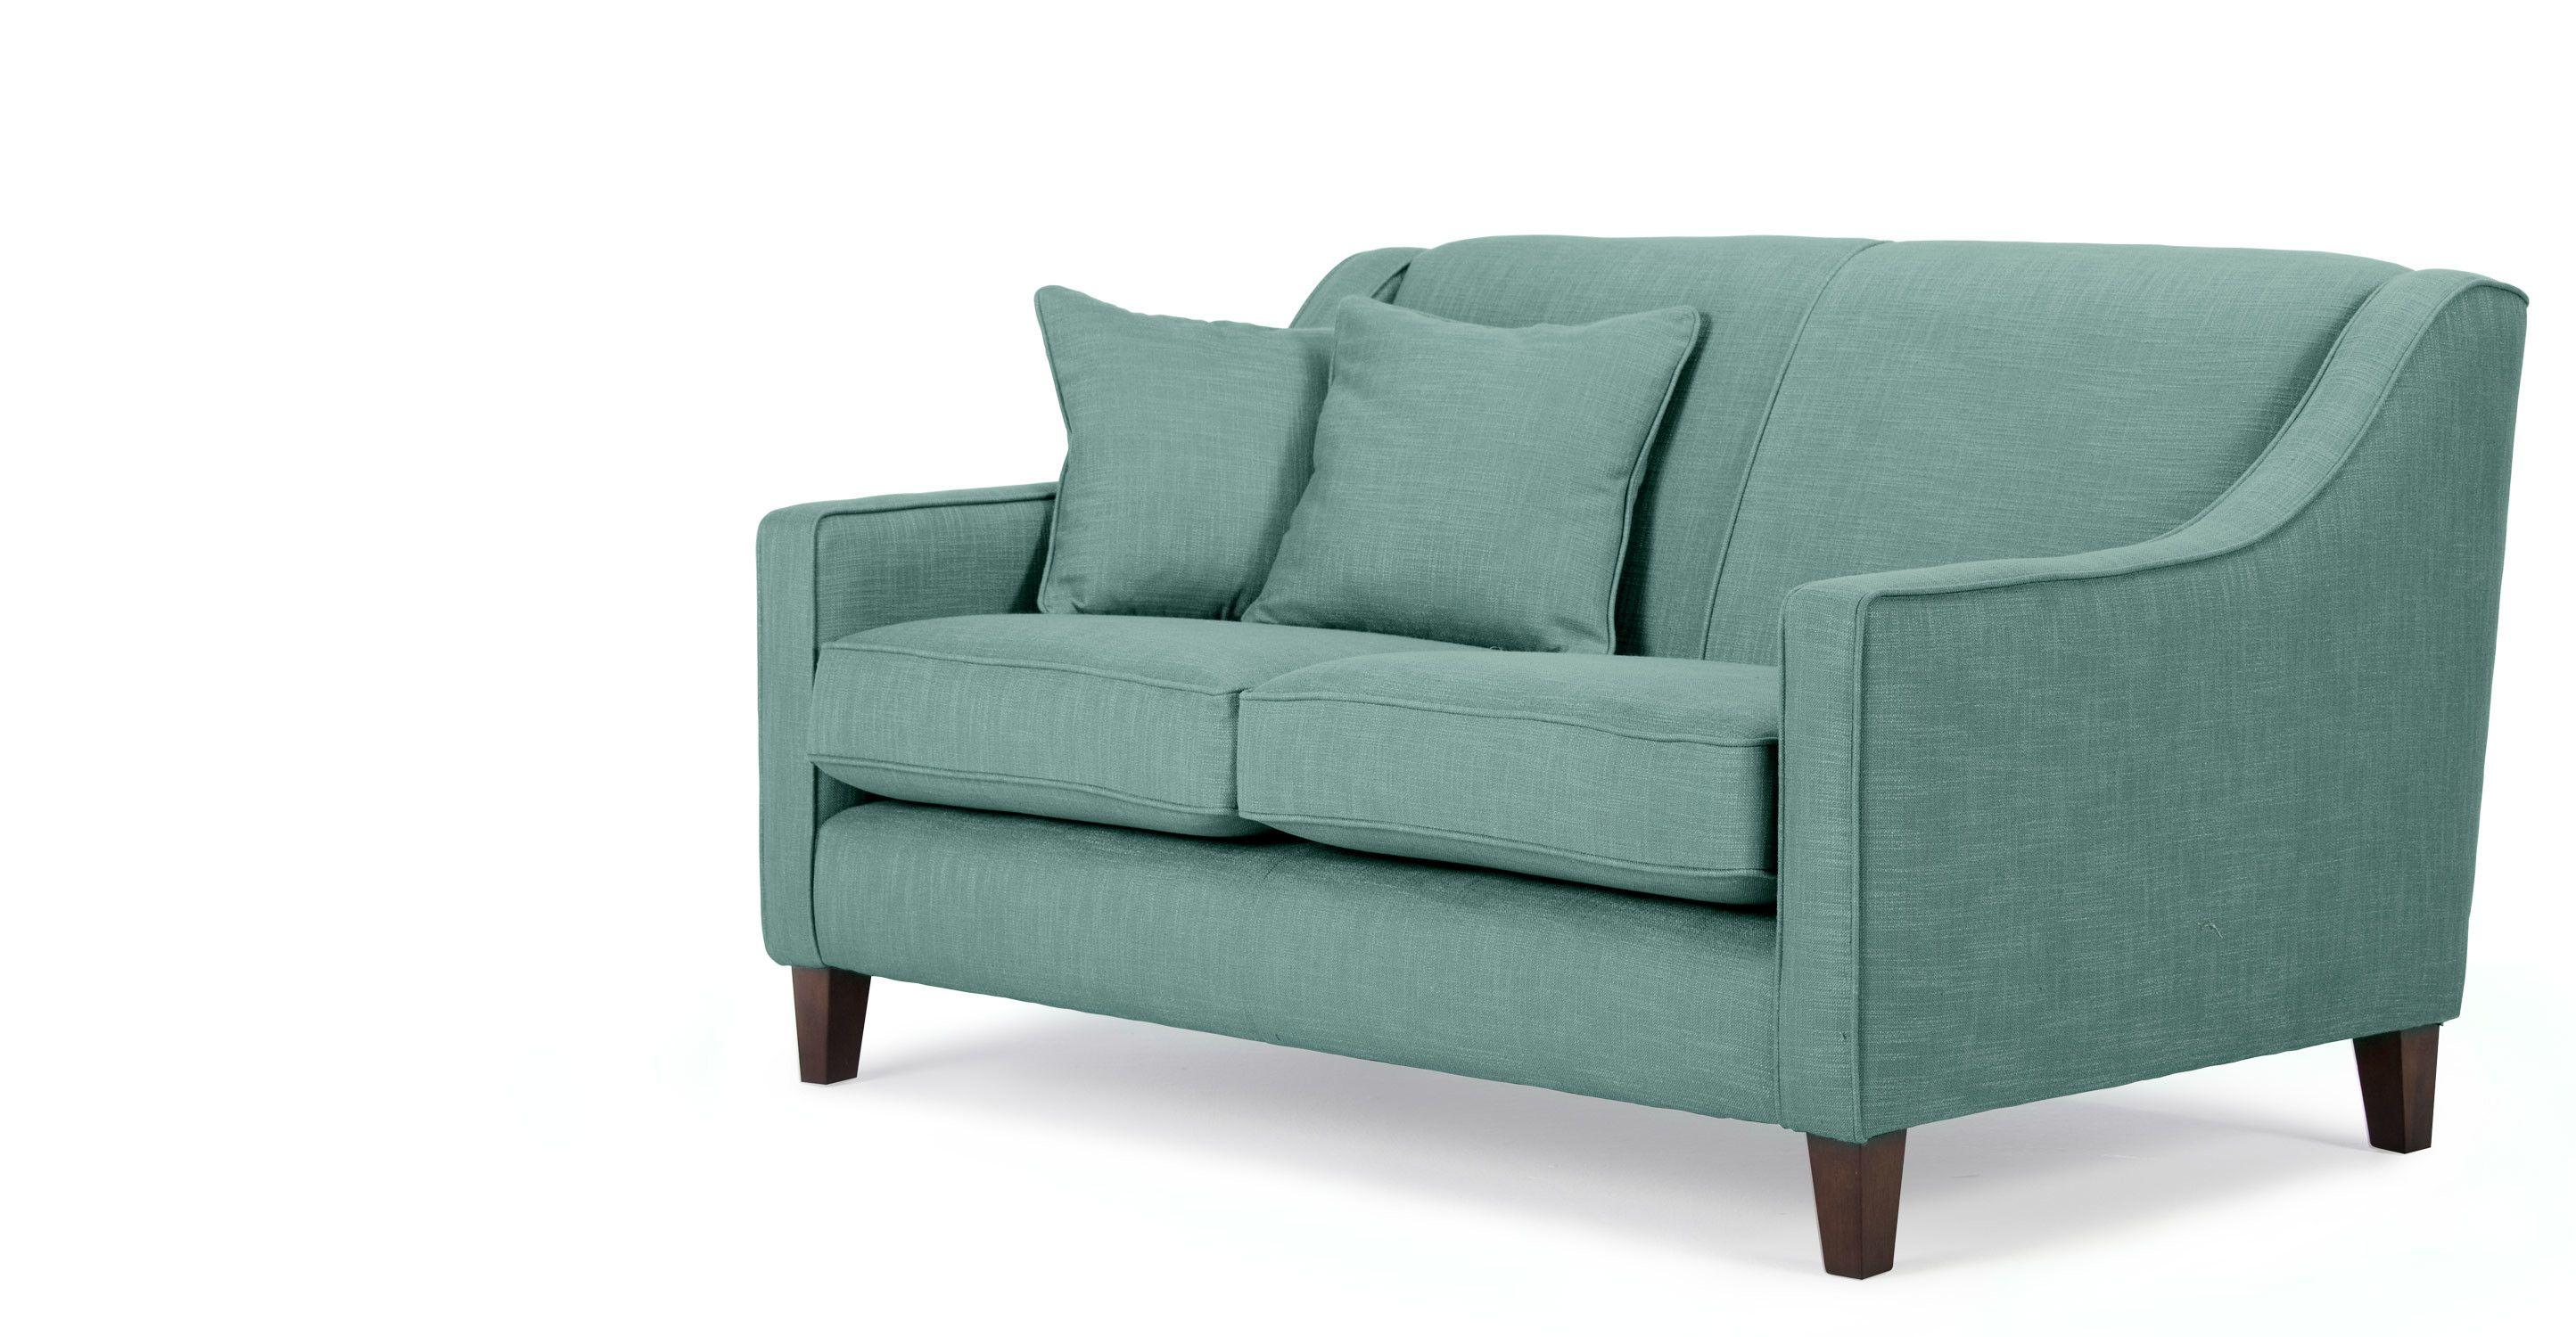 Halston 2 seater sofa in aqua made home decor pinterest explore 2 seater sofa berlin and more parisarafo Choice Image